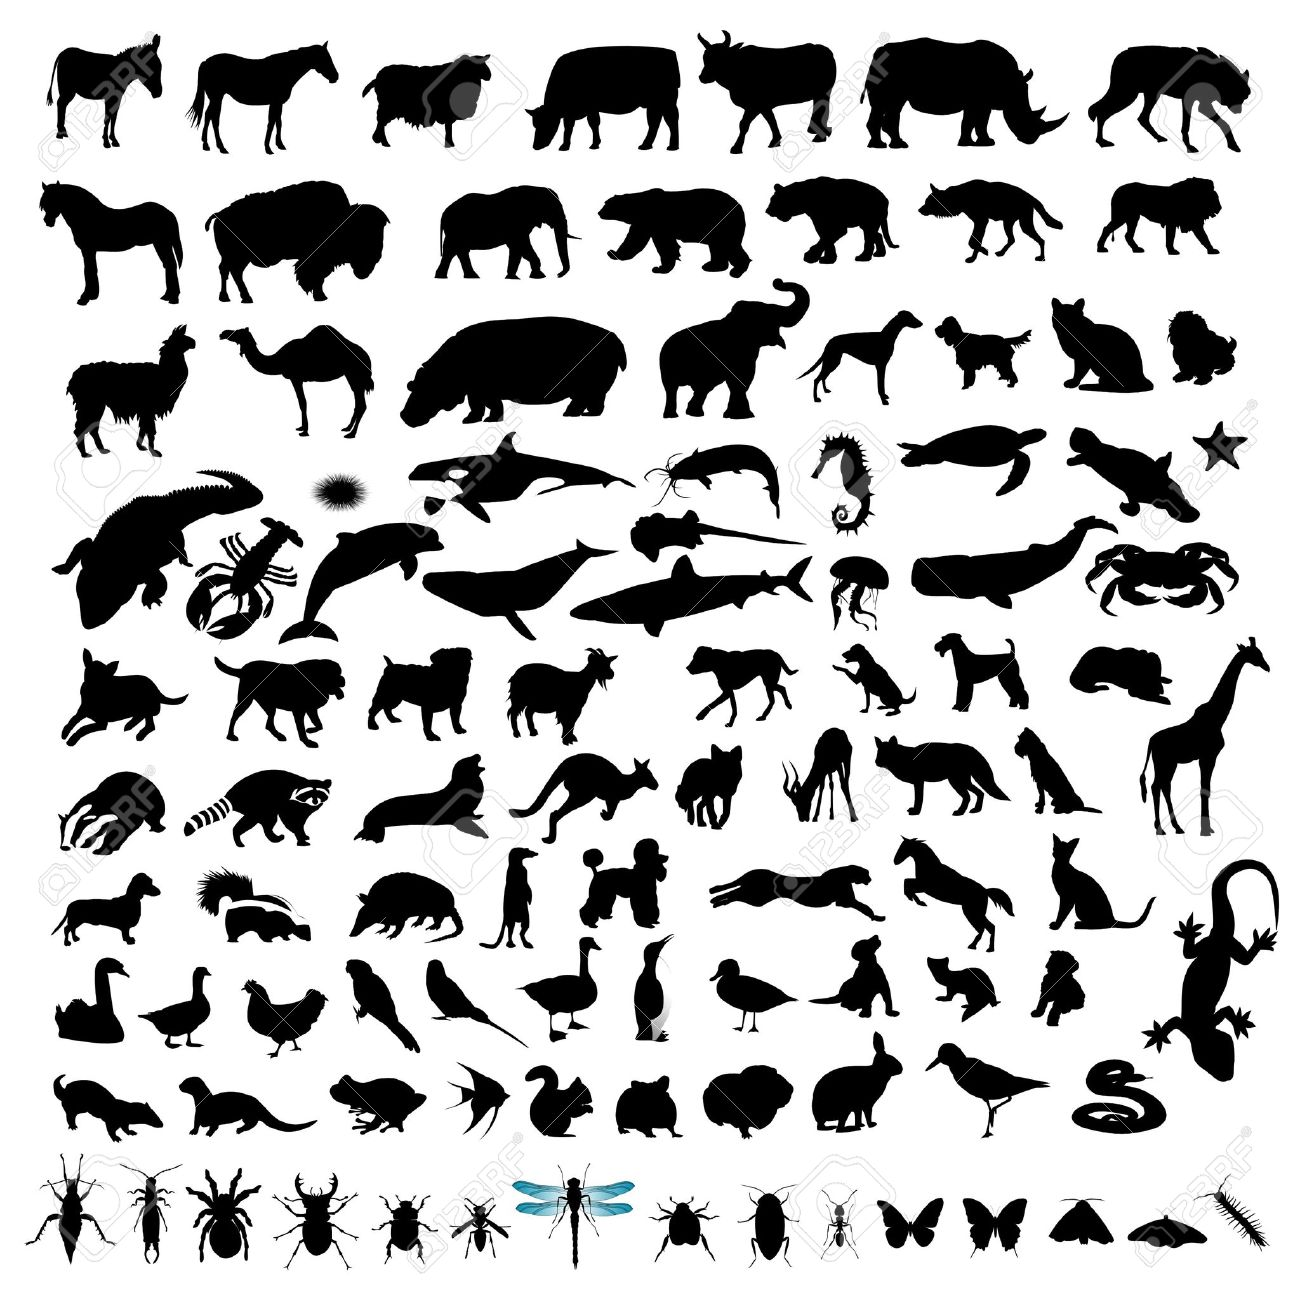 100 Animal Silhouettes Stock Vector - 9678491